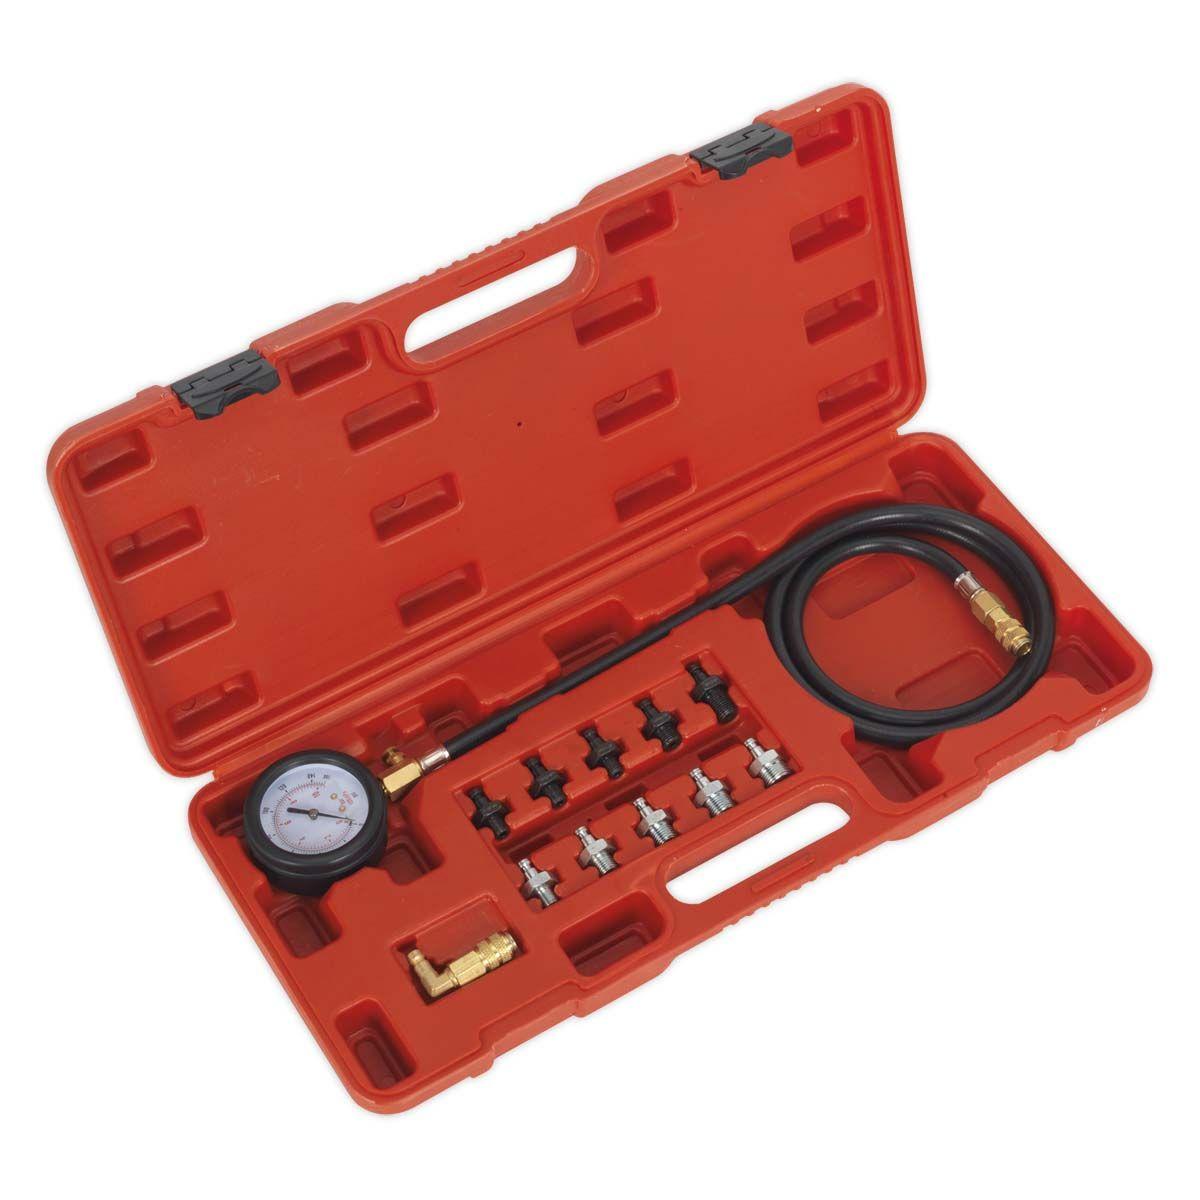 Sealey Oil Pressure Test Kit 12pc